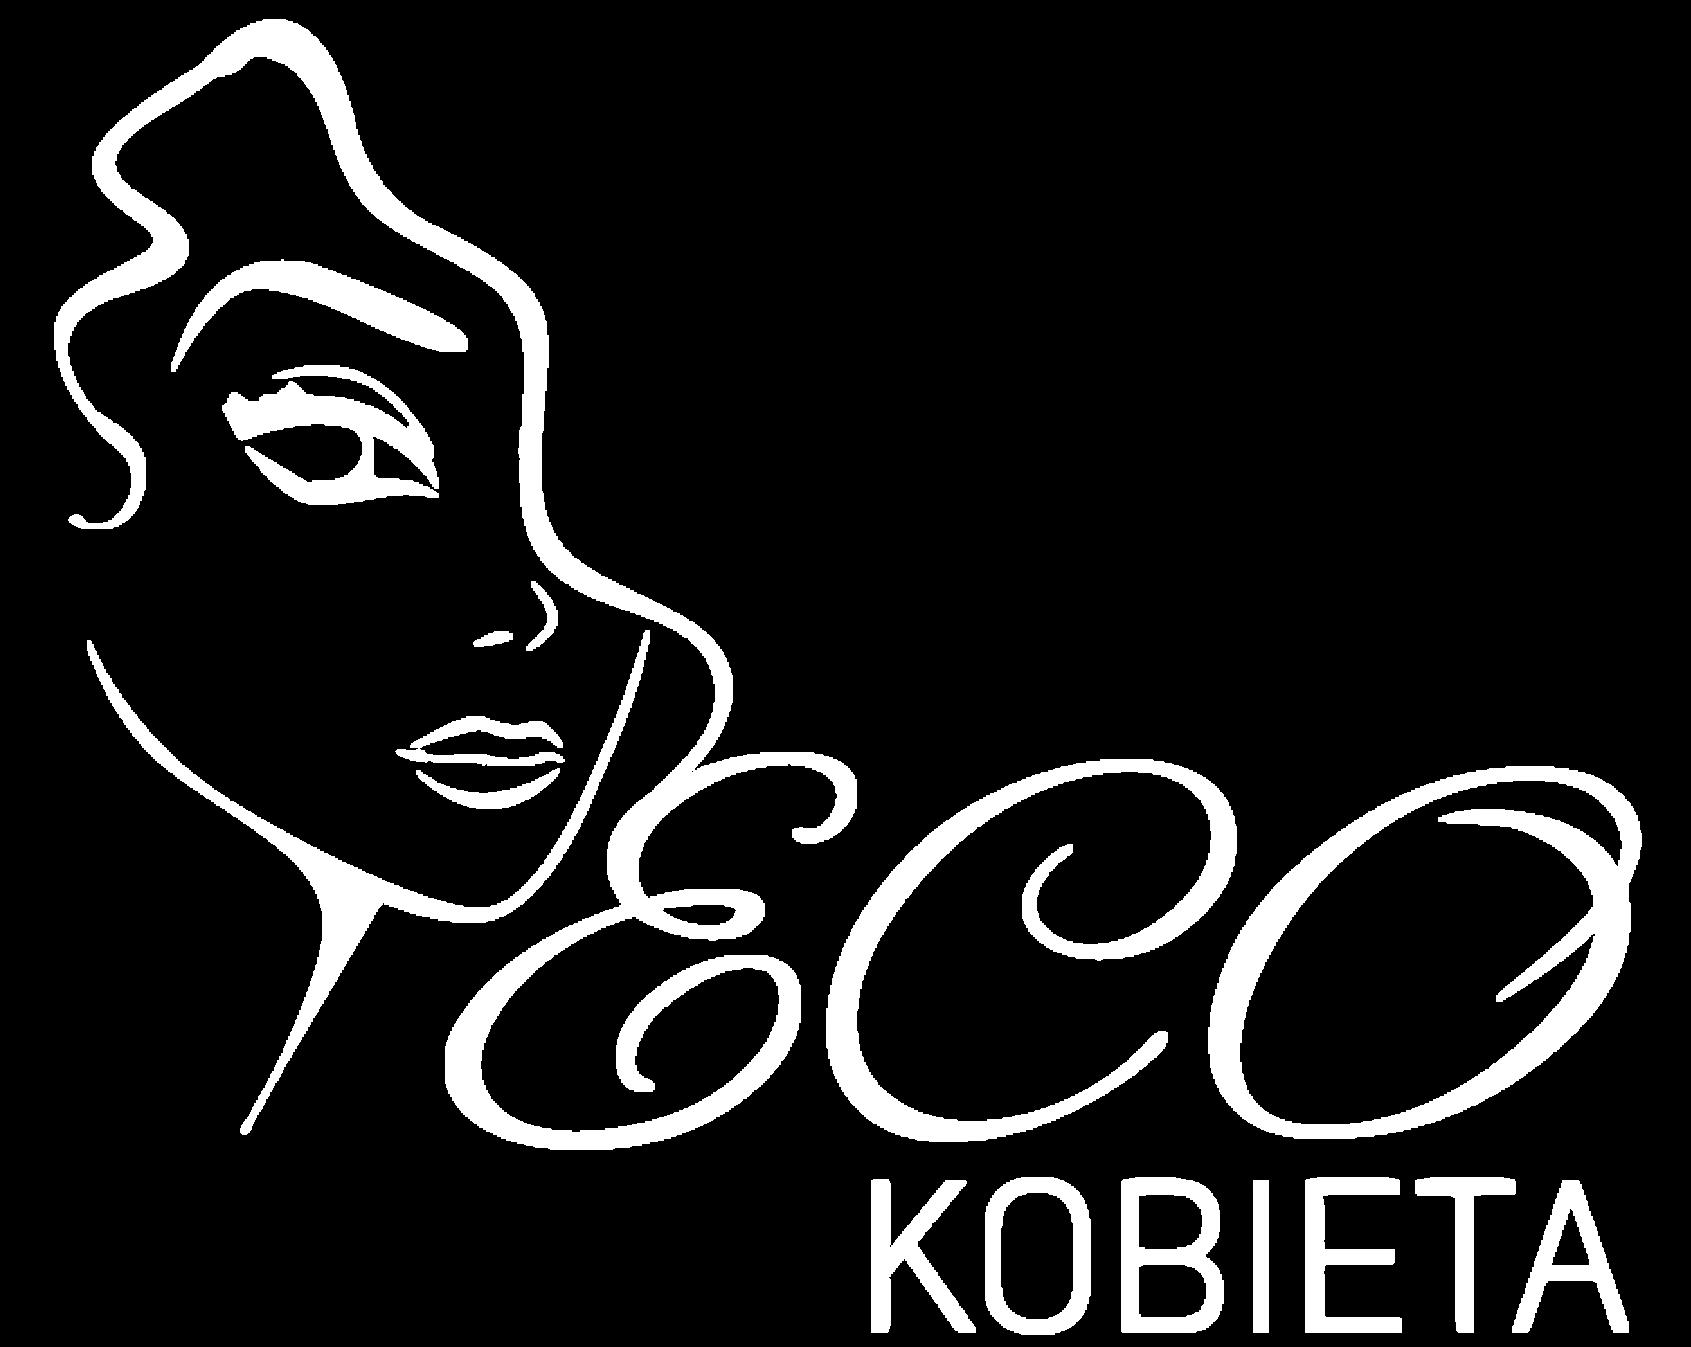 Eco Kobieta